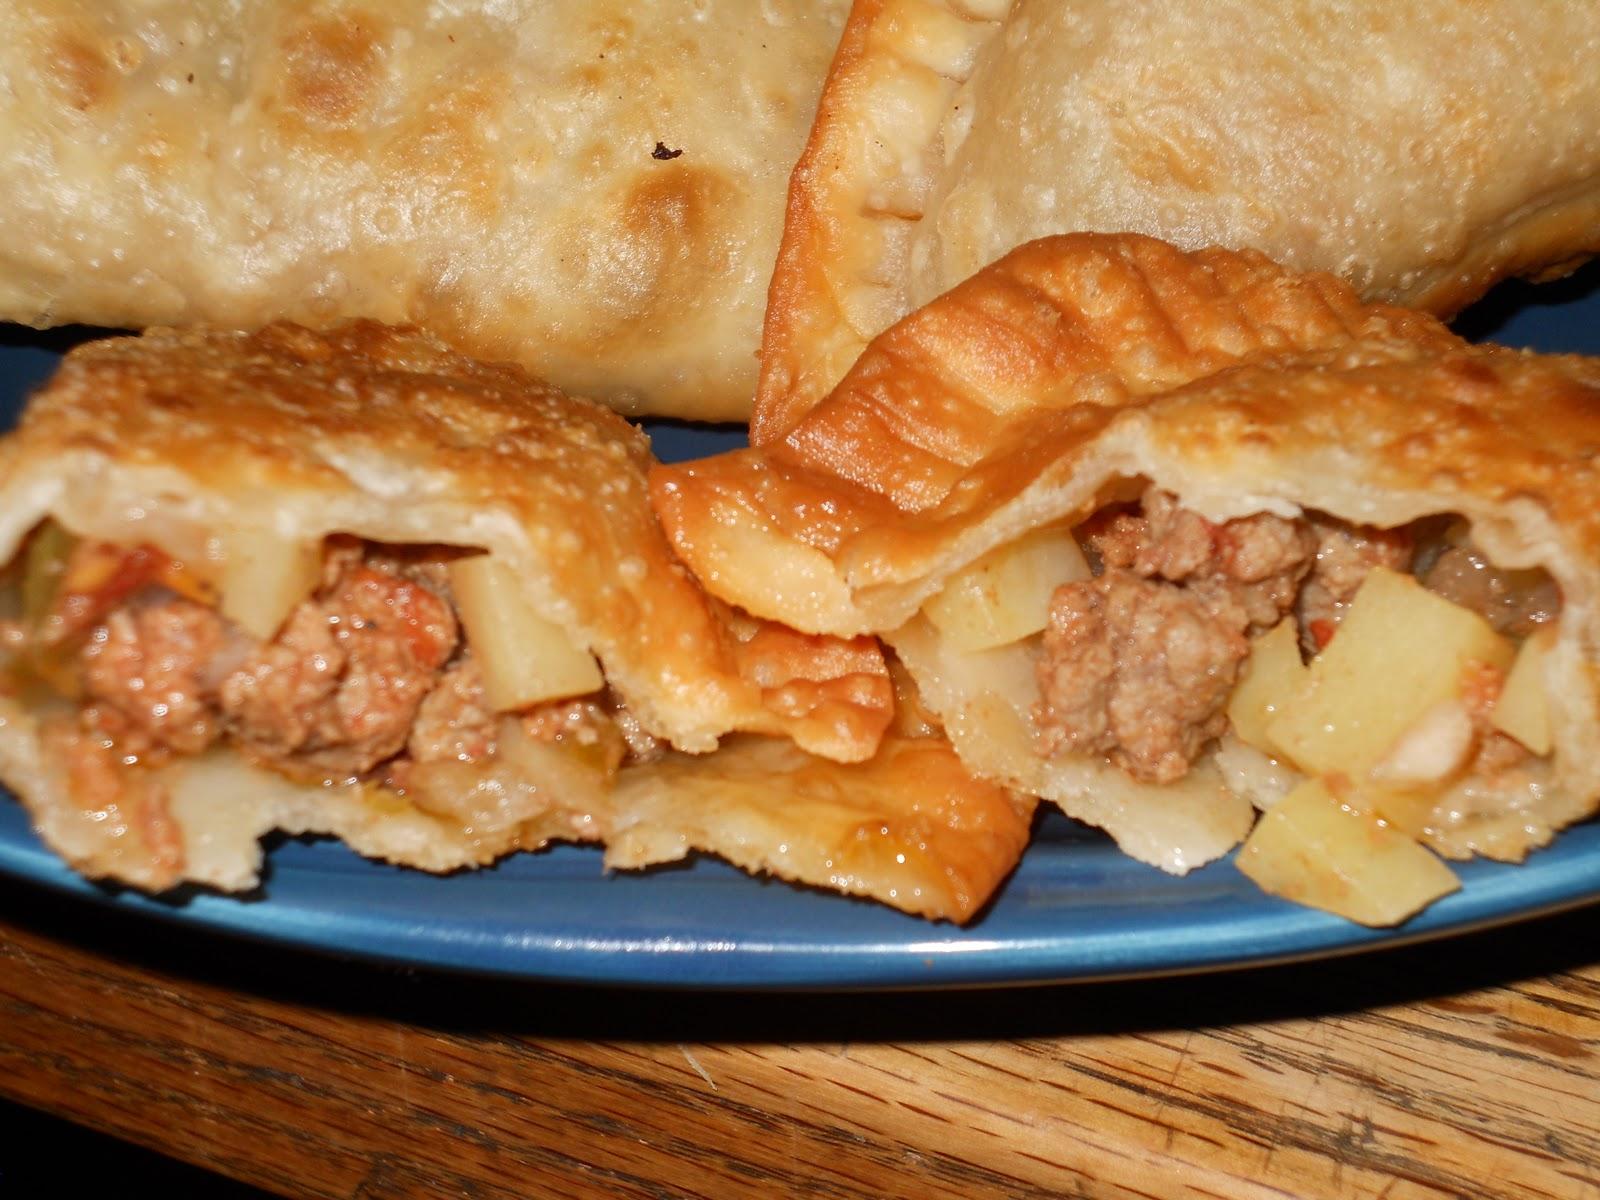 ... picadillo turkey picadillo empanadas filled with chicken picadillo